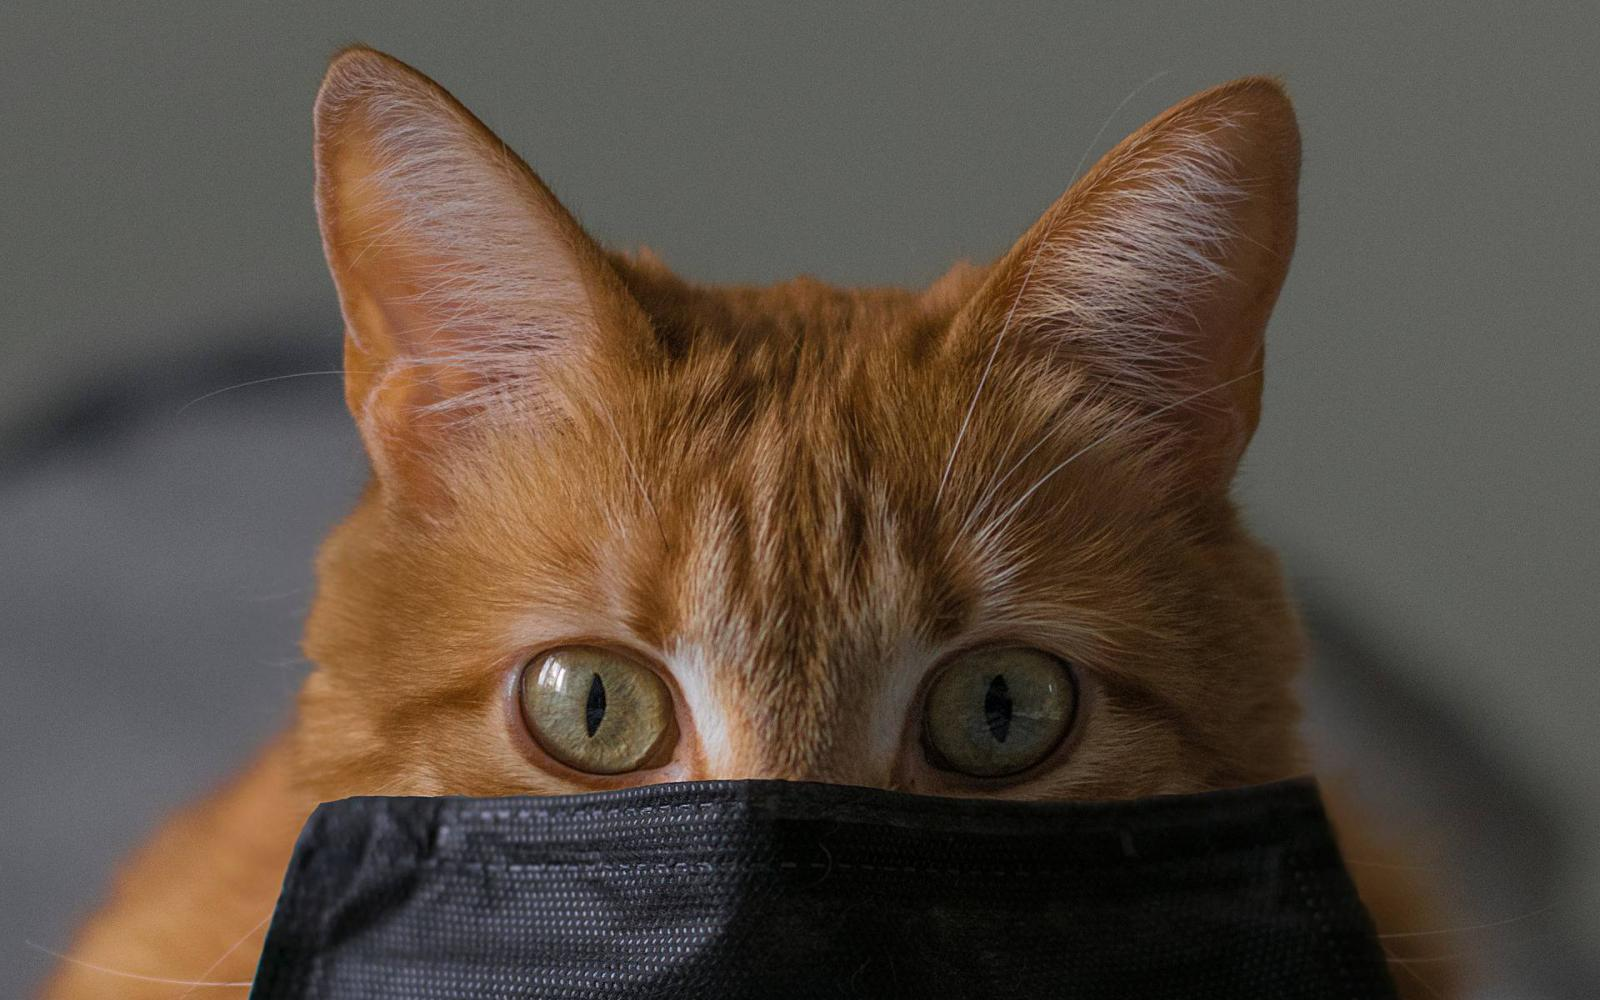 macska pénzt keres video demo számla opción